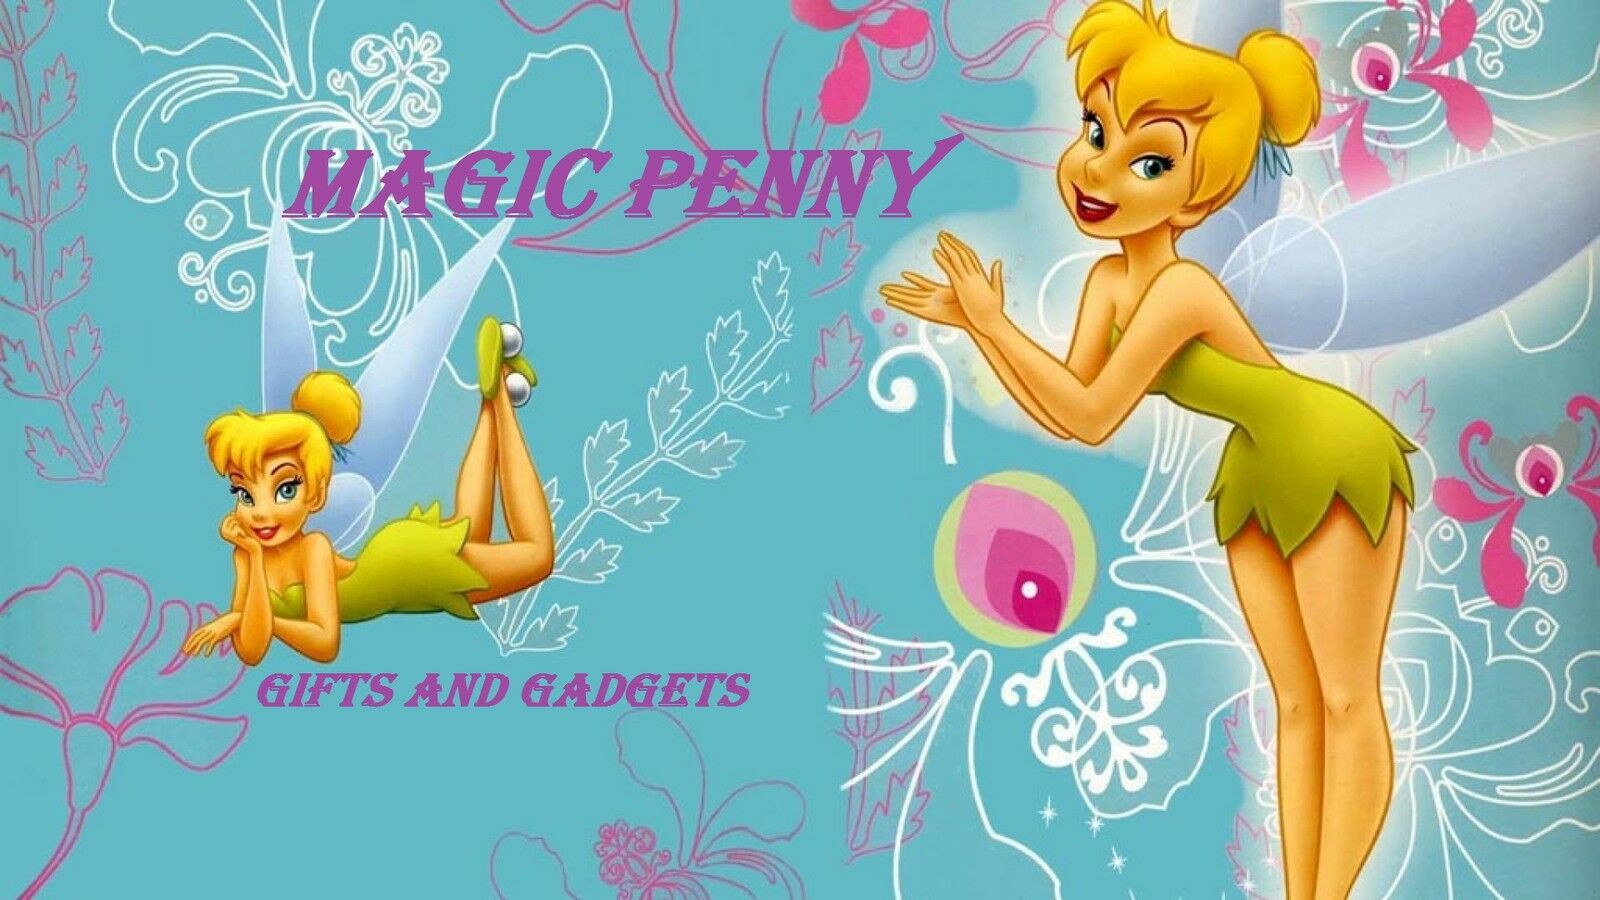 The Magic Penny